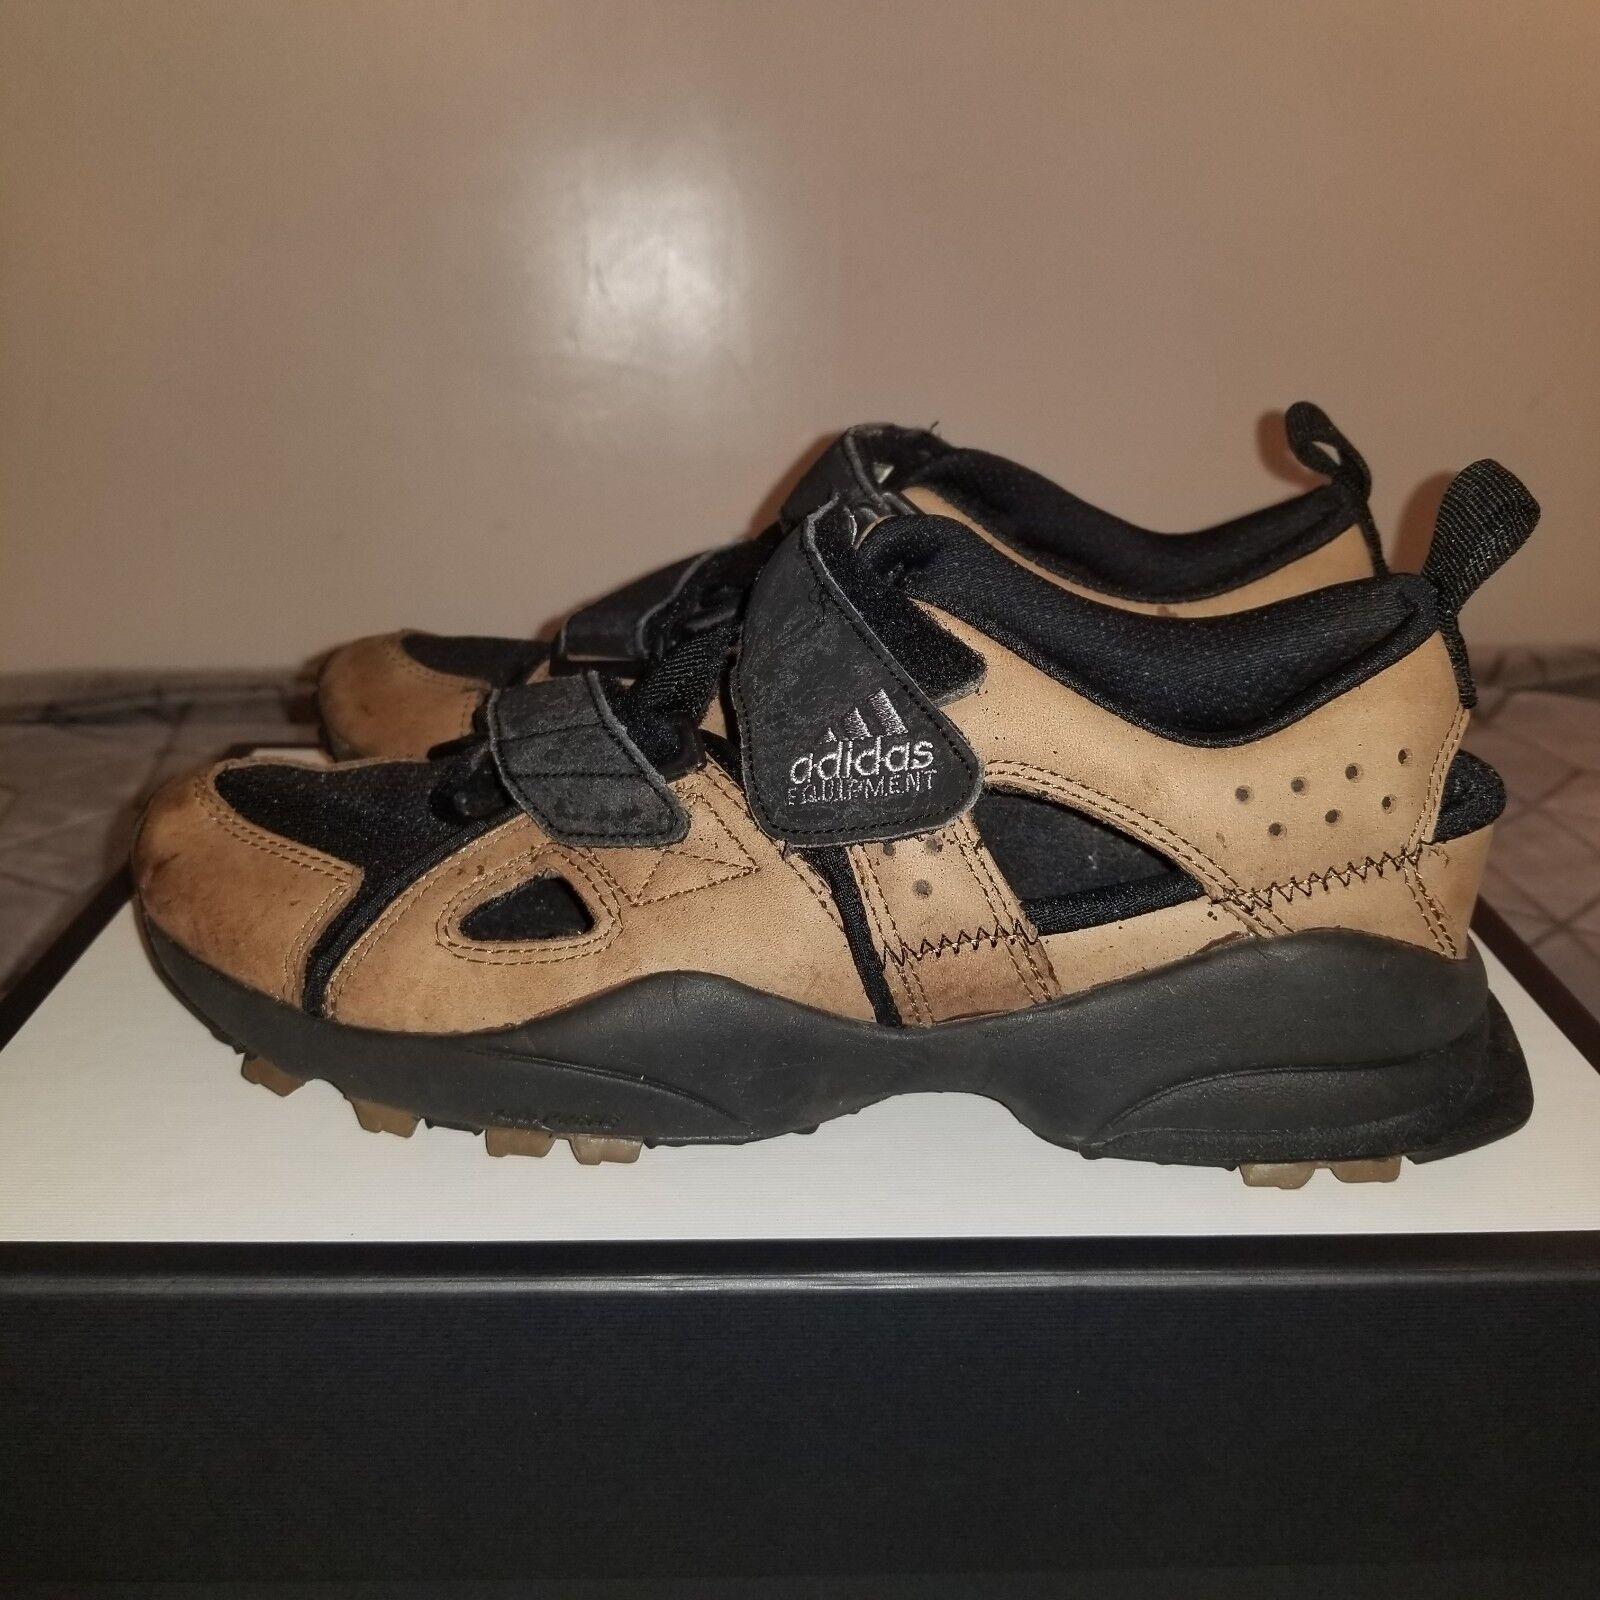 B14 1995 Adidas Equipment Adventure Sandal ORIGINAL US Size 10 BROWN